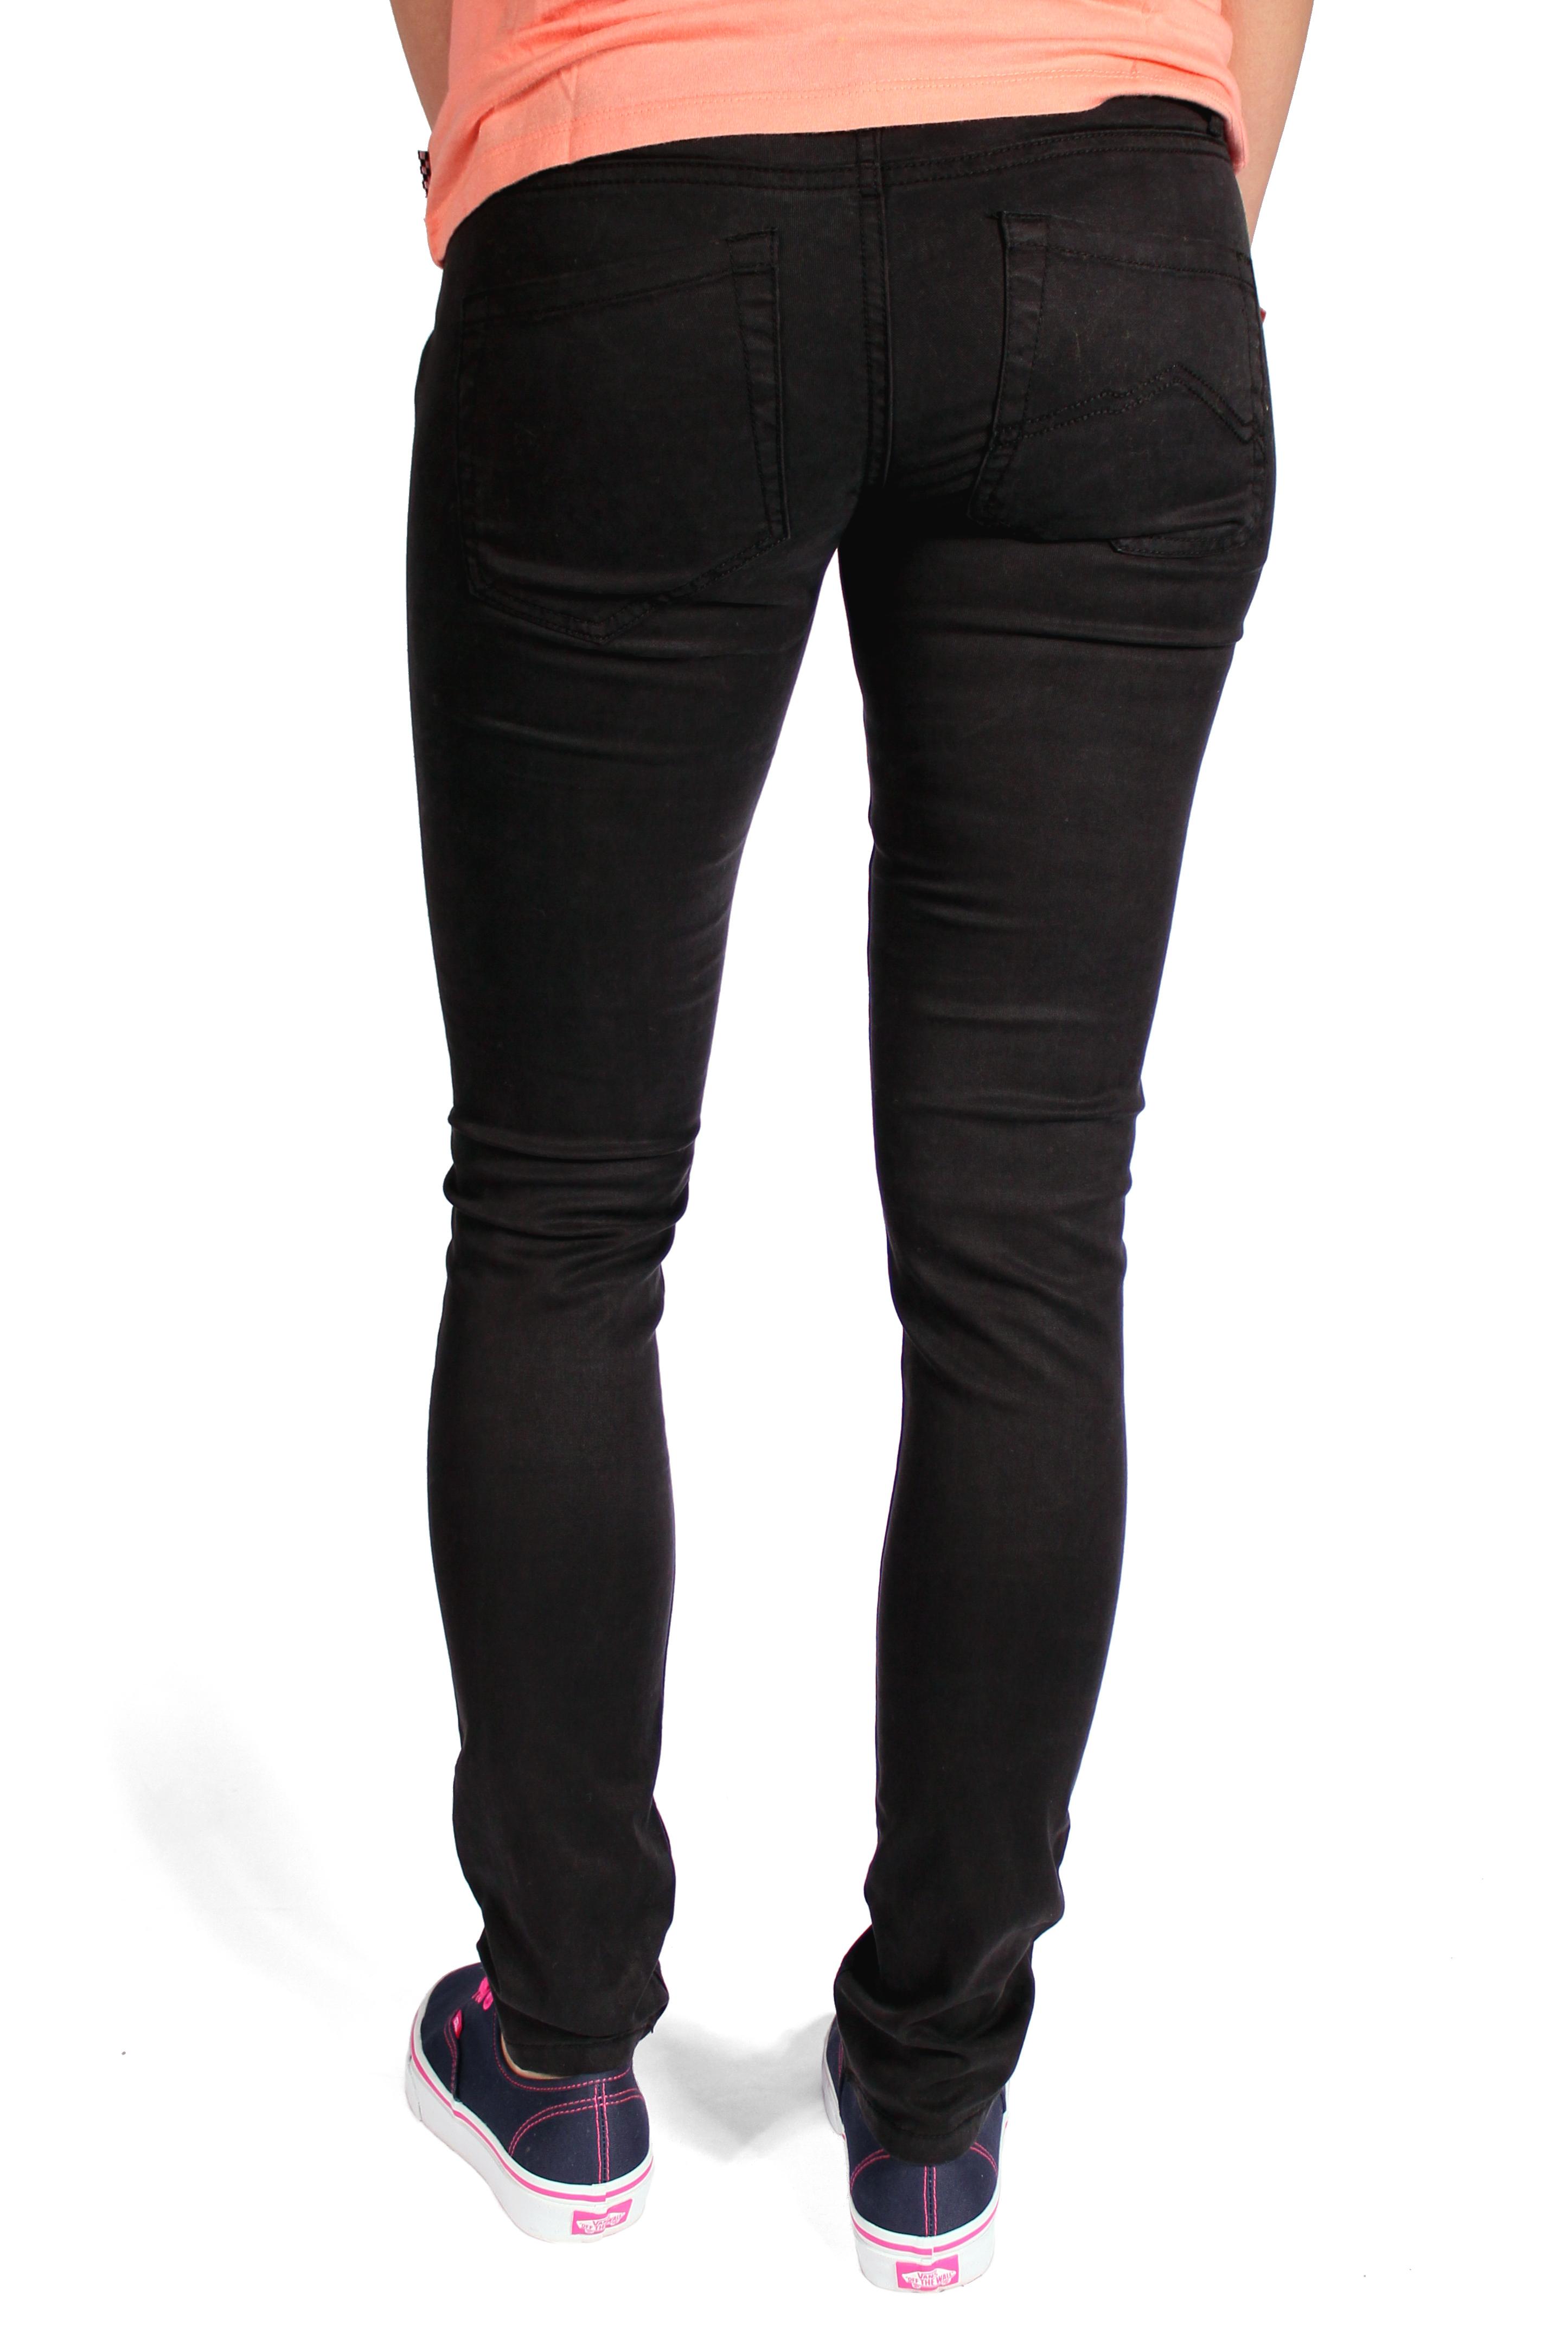 Spodnie Damskie Burton Lorimer Jegging (True Black)